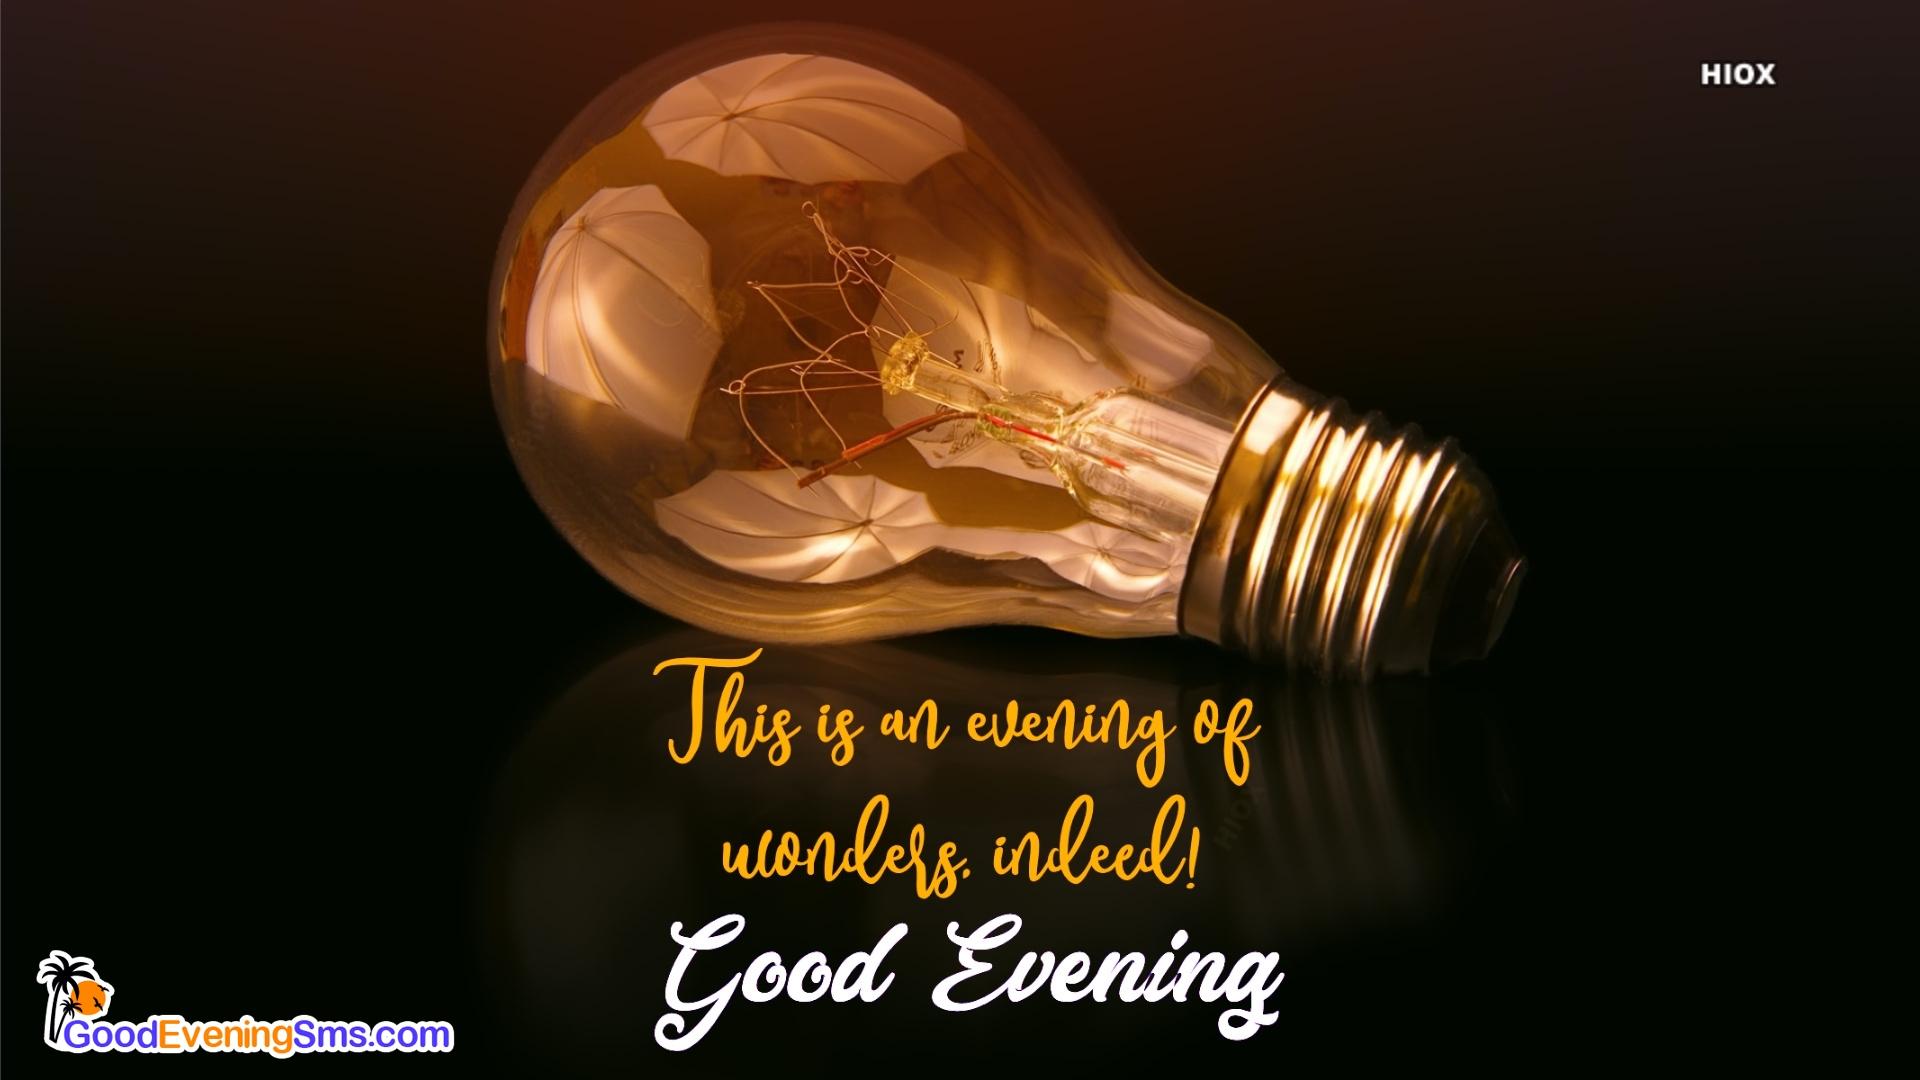 Good Evening Message To A Friend